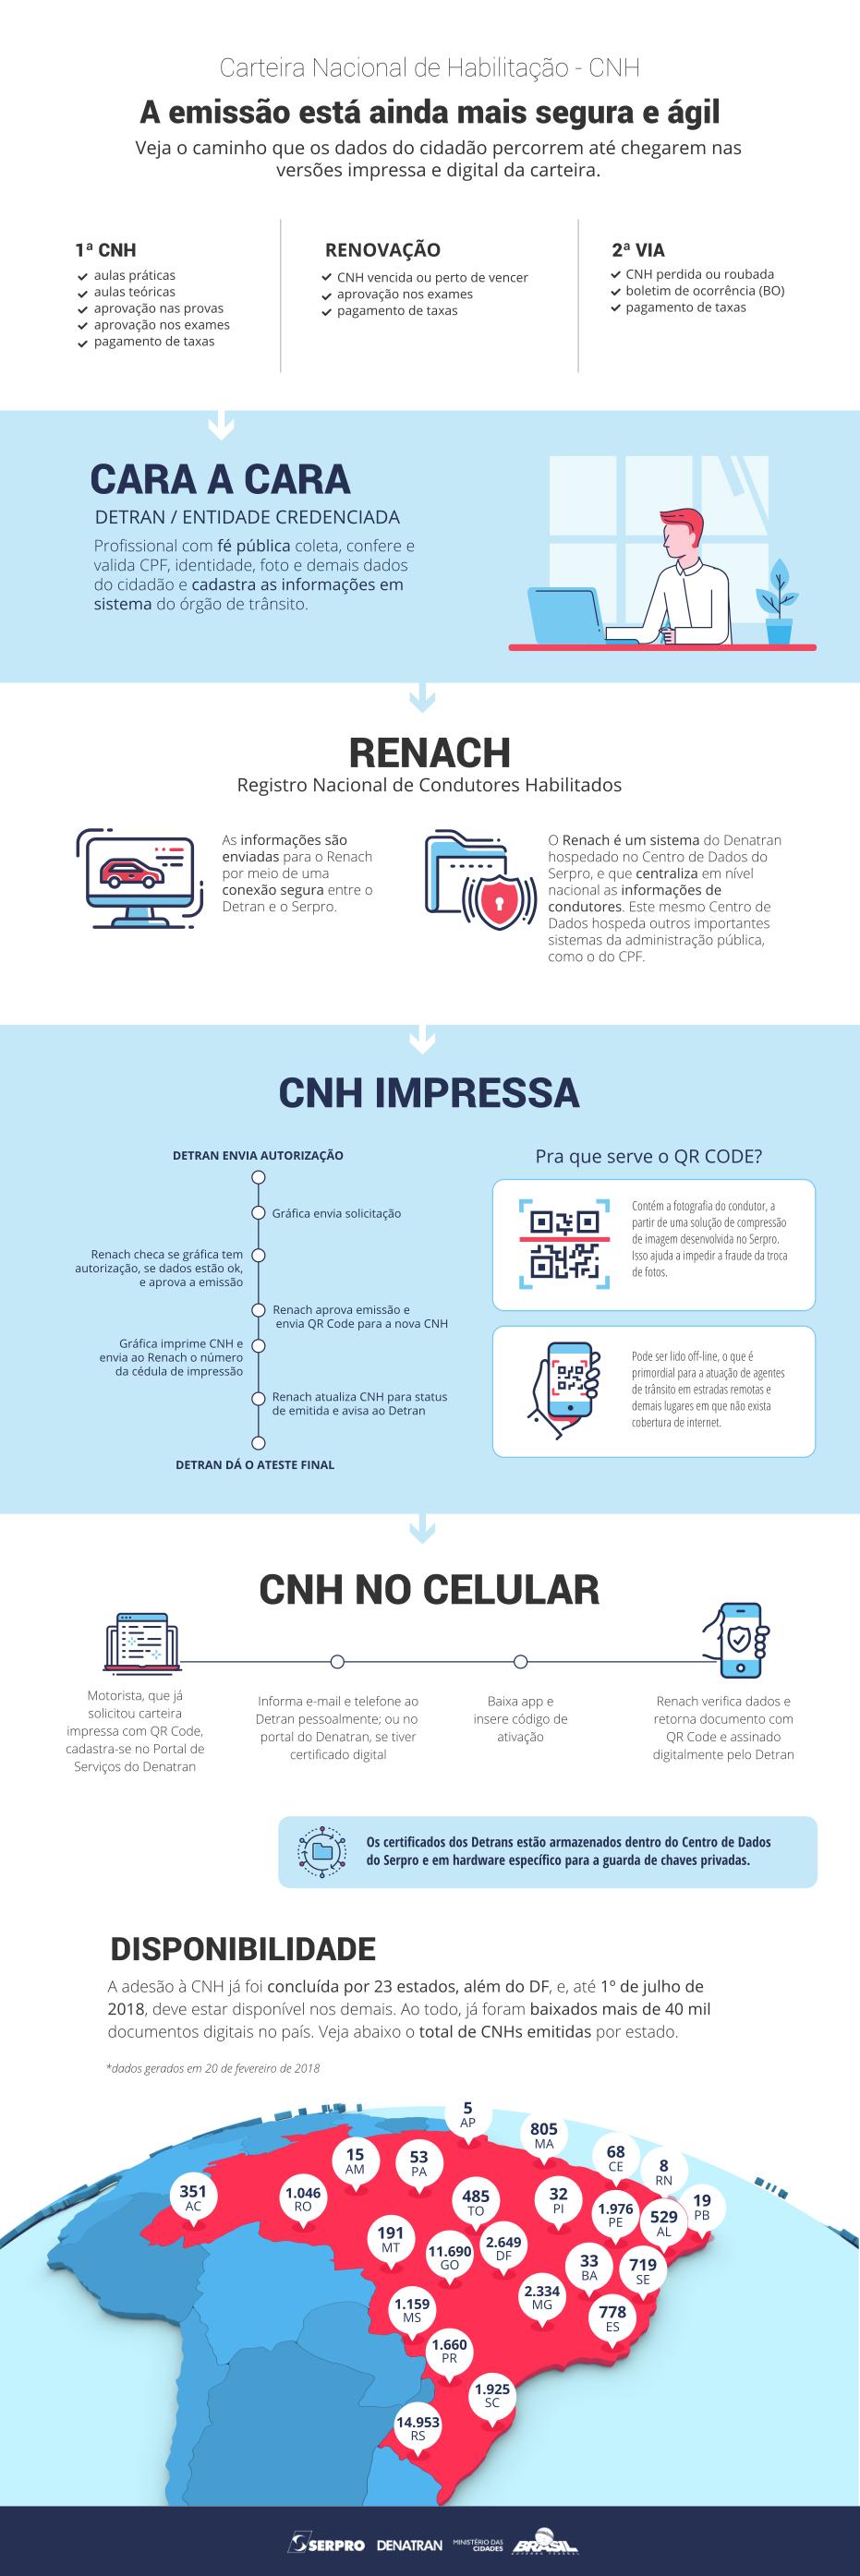 Infografico CNPJ4.png